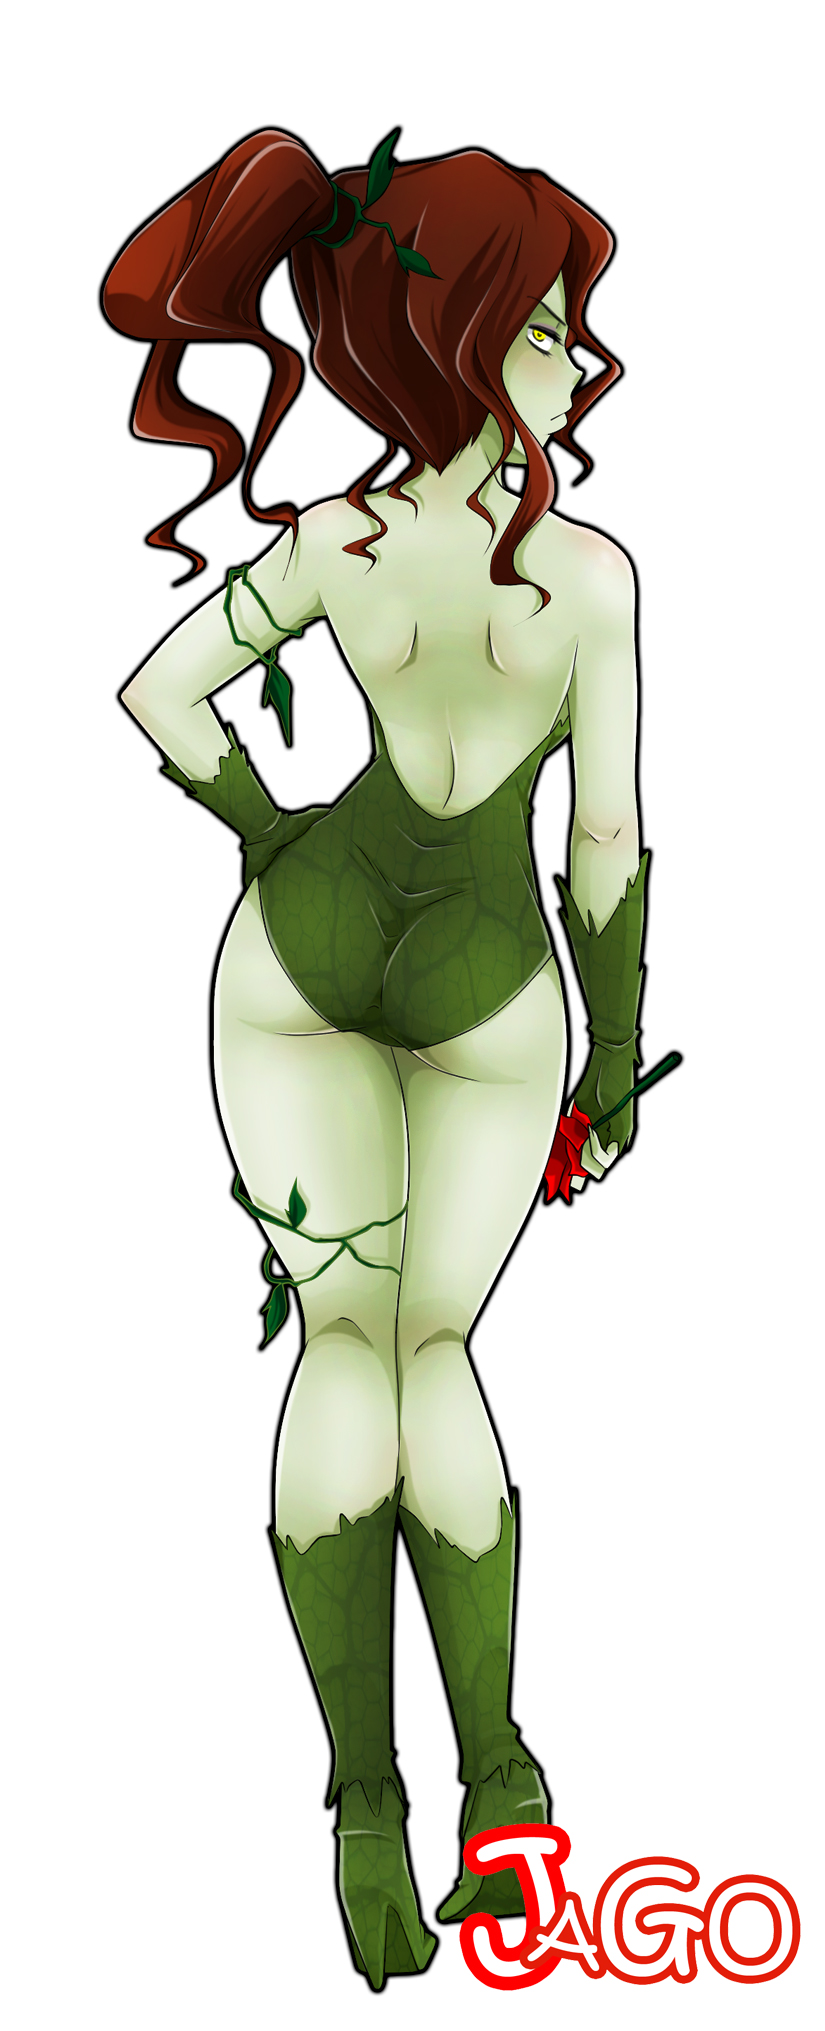 ¡Club Ecchi! Only Perverts - Página 2 Poison_ivy_by_jagodibuja-d6k6tzw